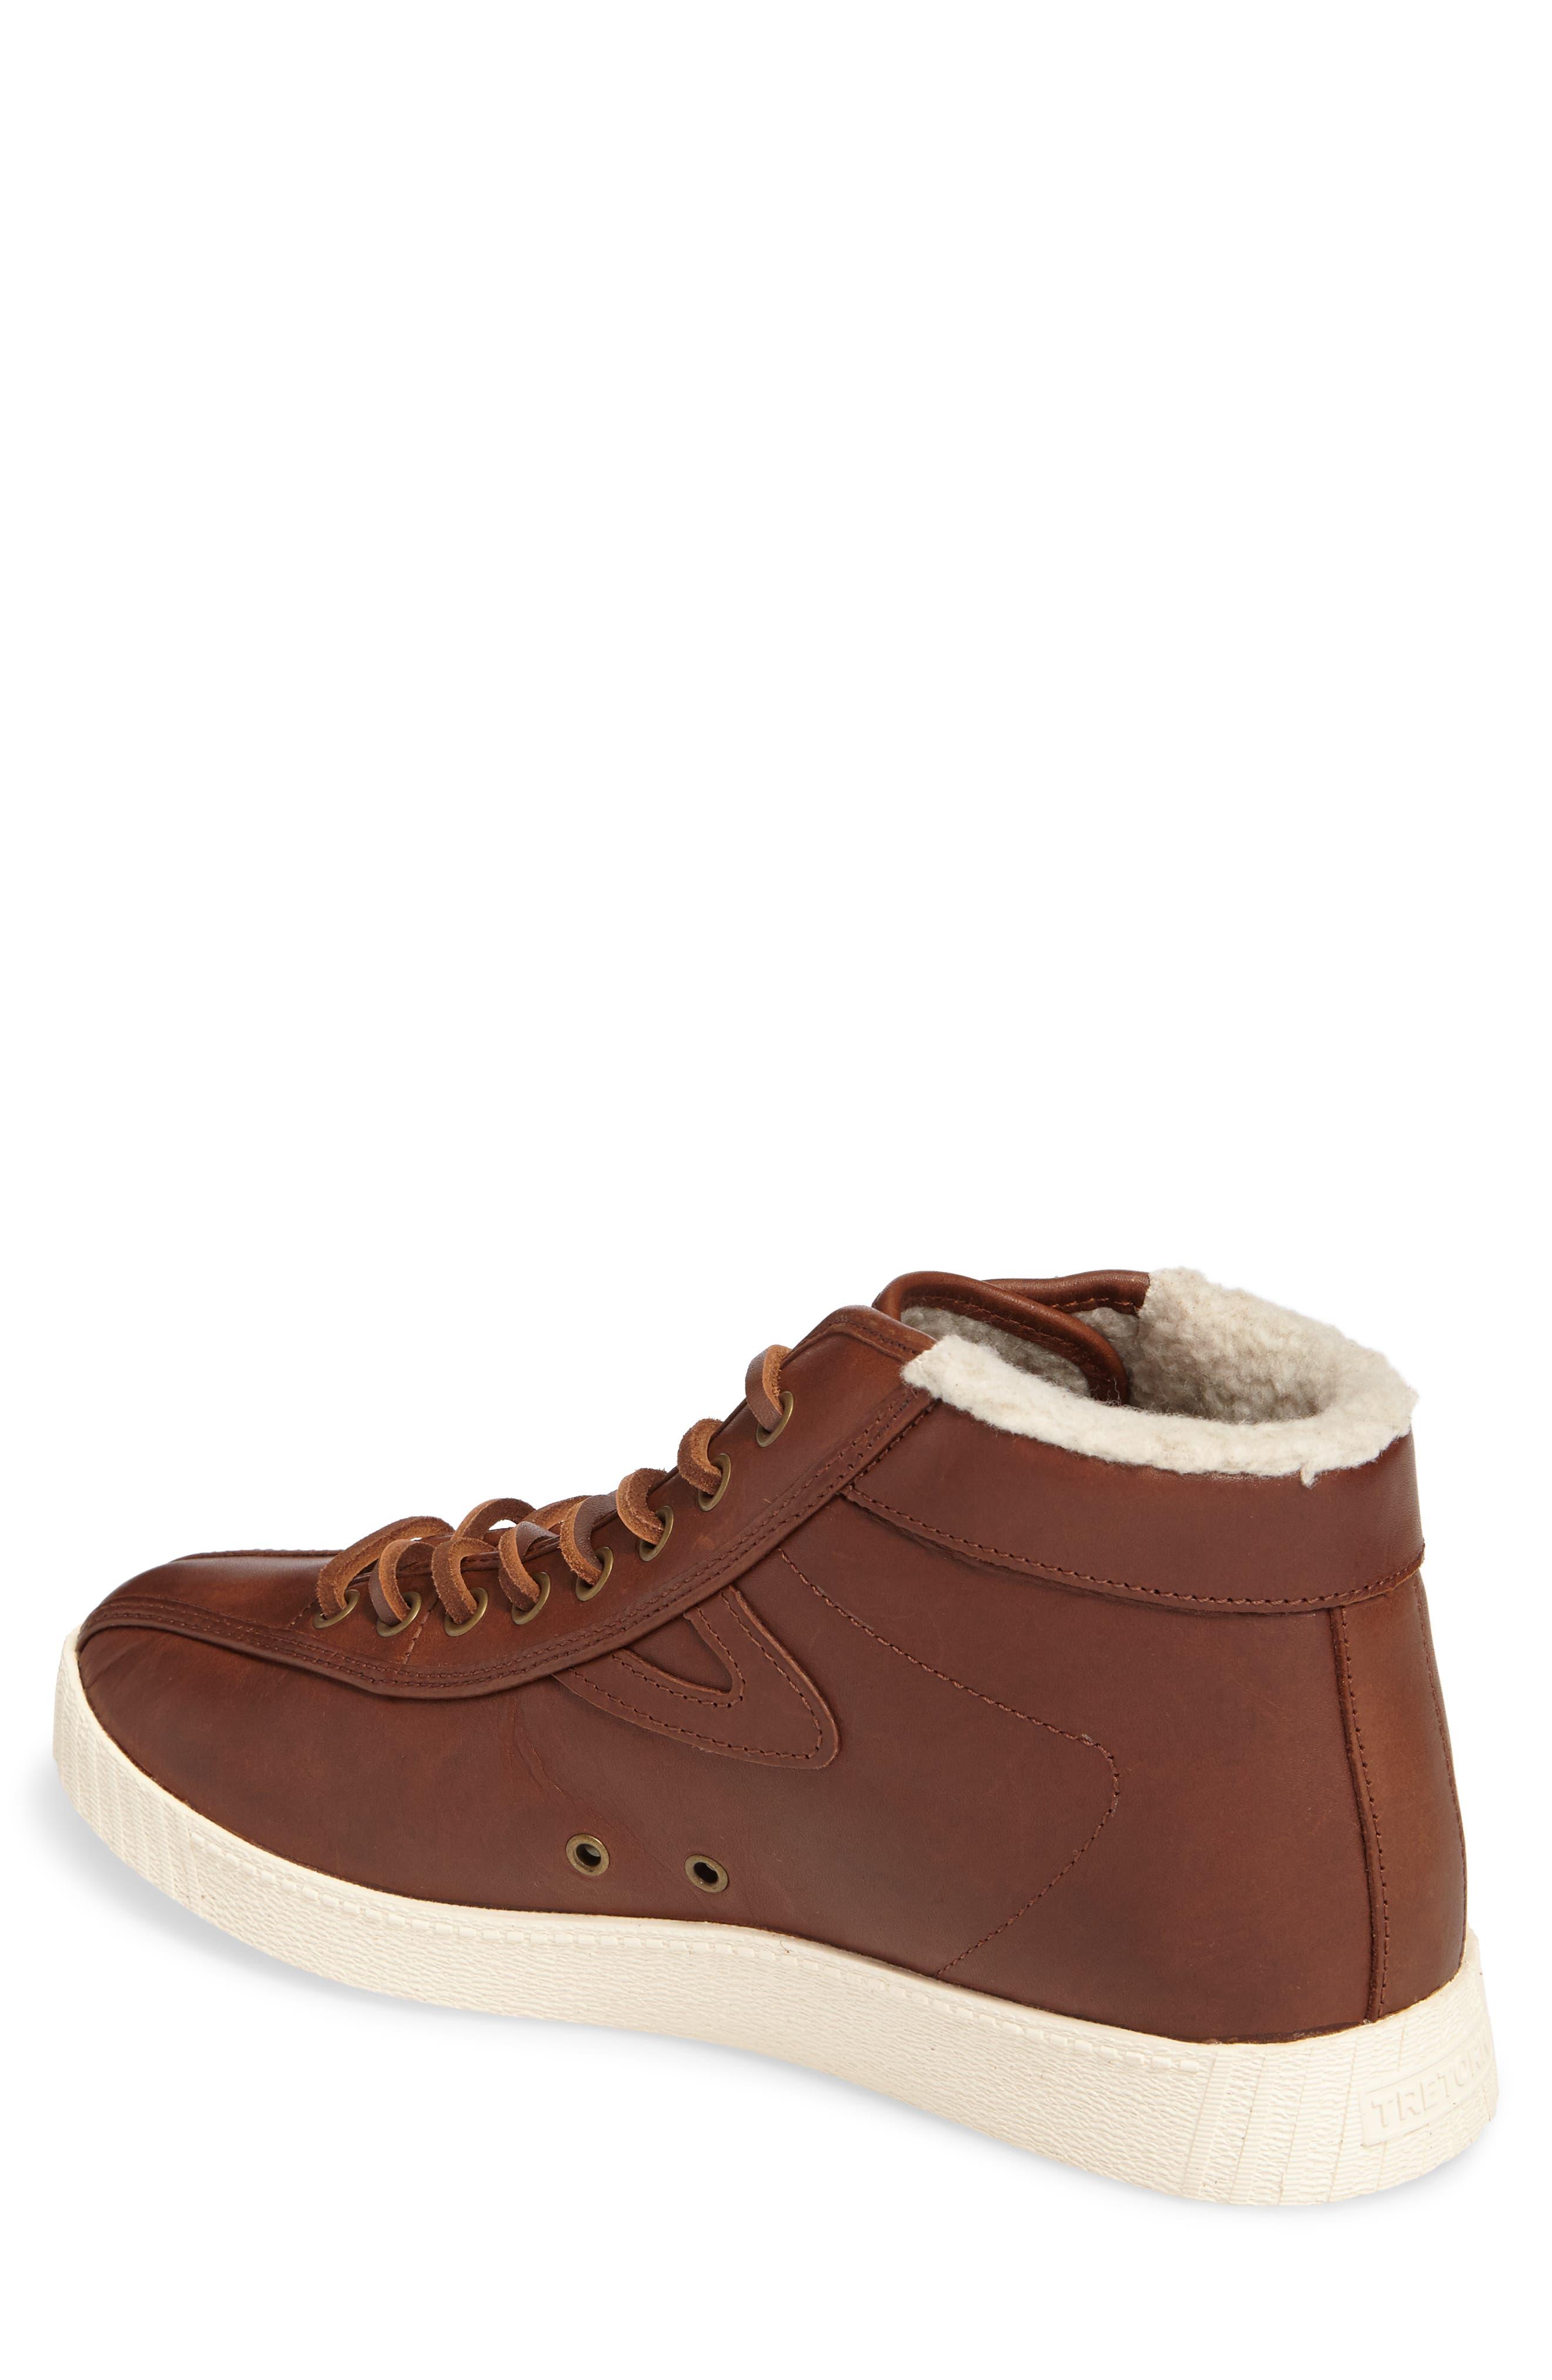 Alternate Image 2  - Tretorn Nylite Hi 2 Sneaker (Men)